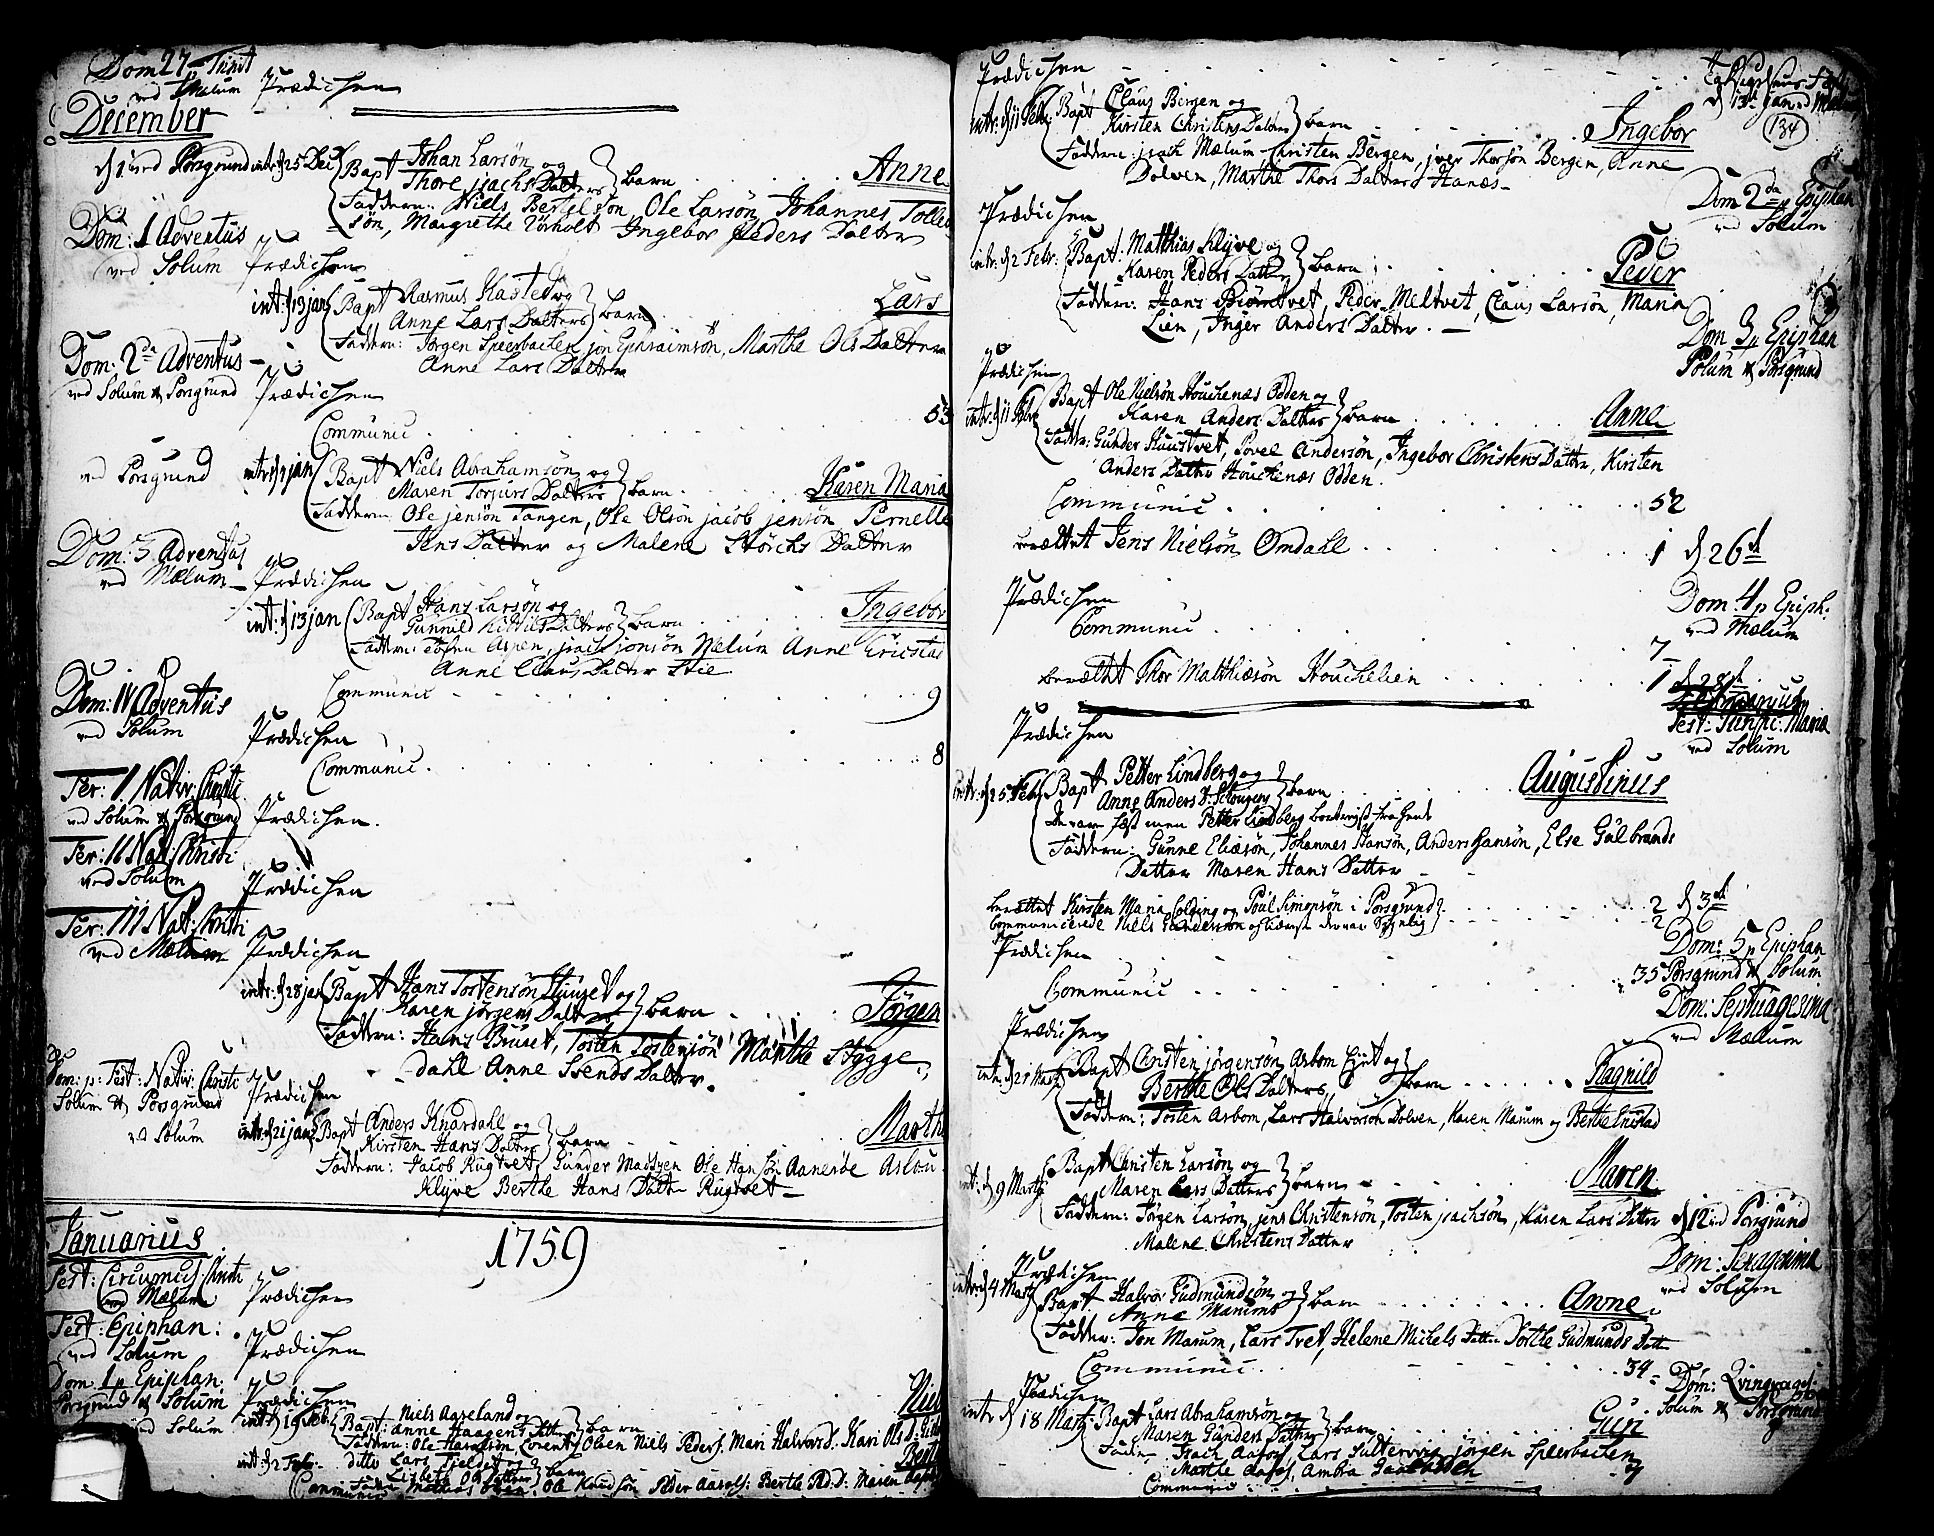 SAKO, Solum kirkebøker, F/Fa/L0002: Ministerialbok nr. I 2, 1713-1761, s. 134